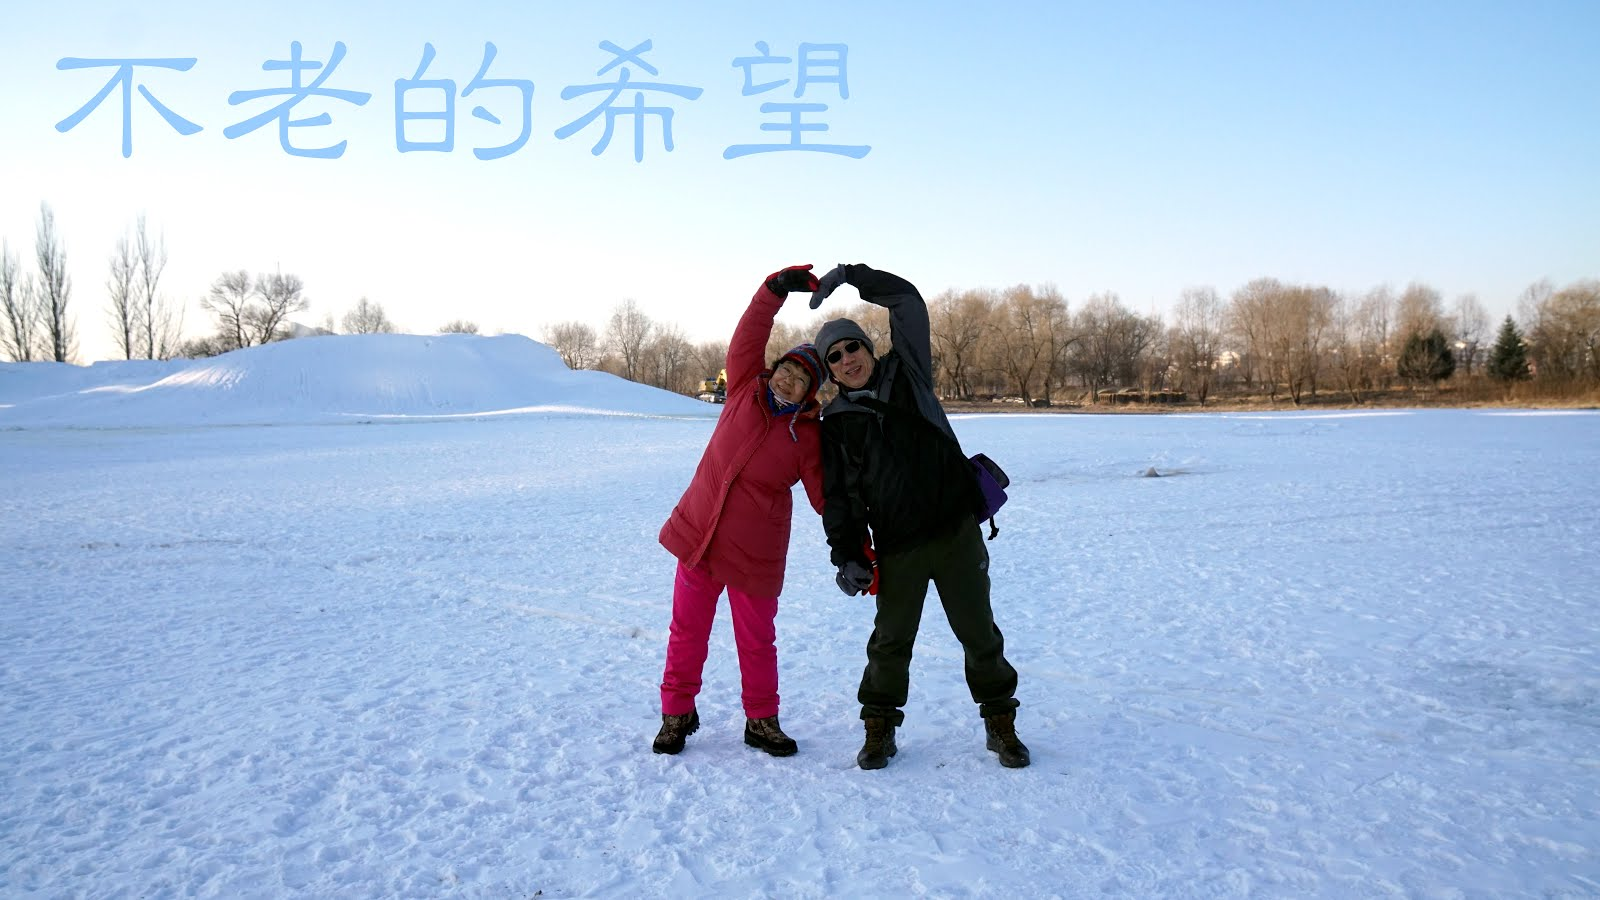 """不老的希望"" hope@always"